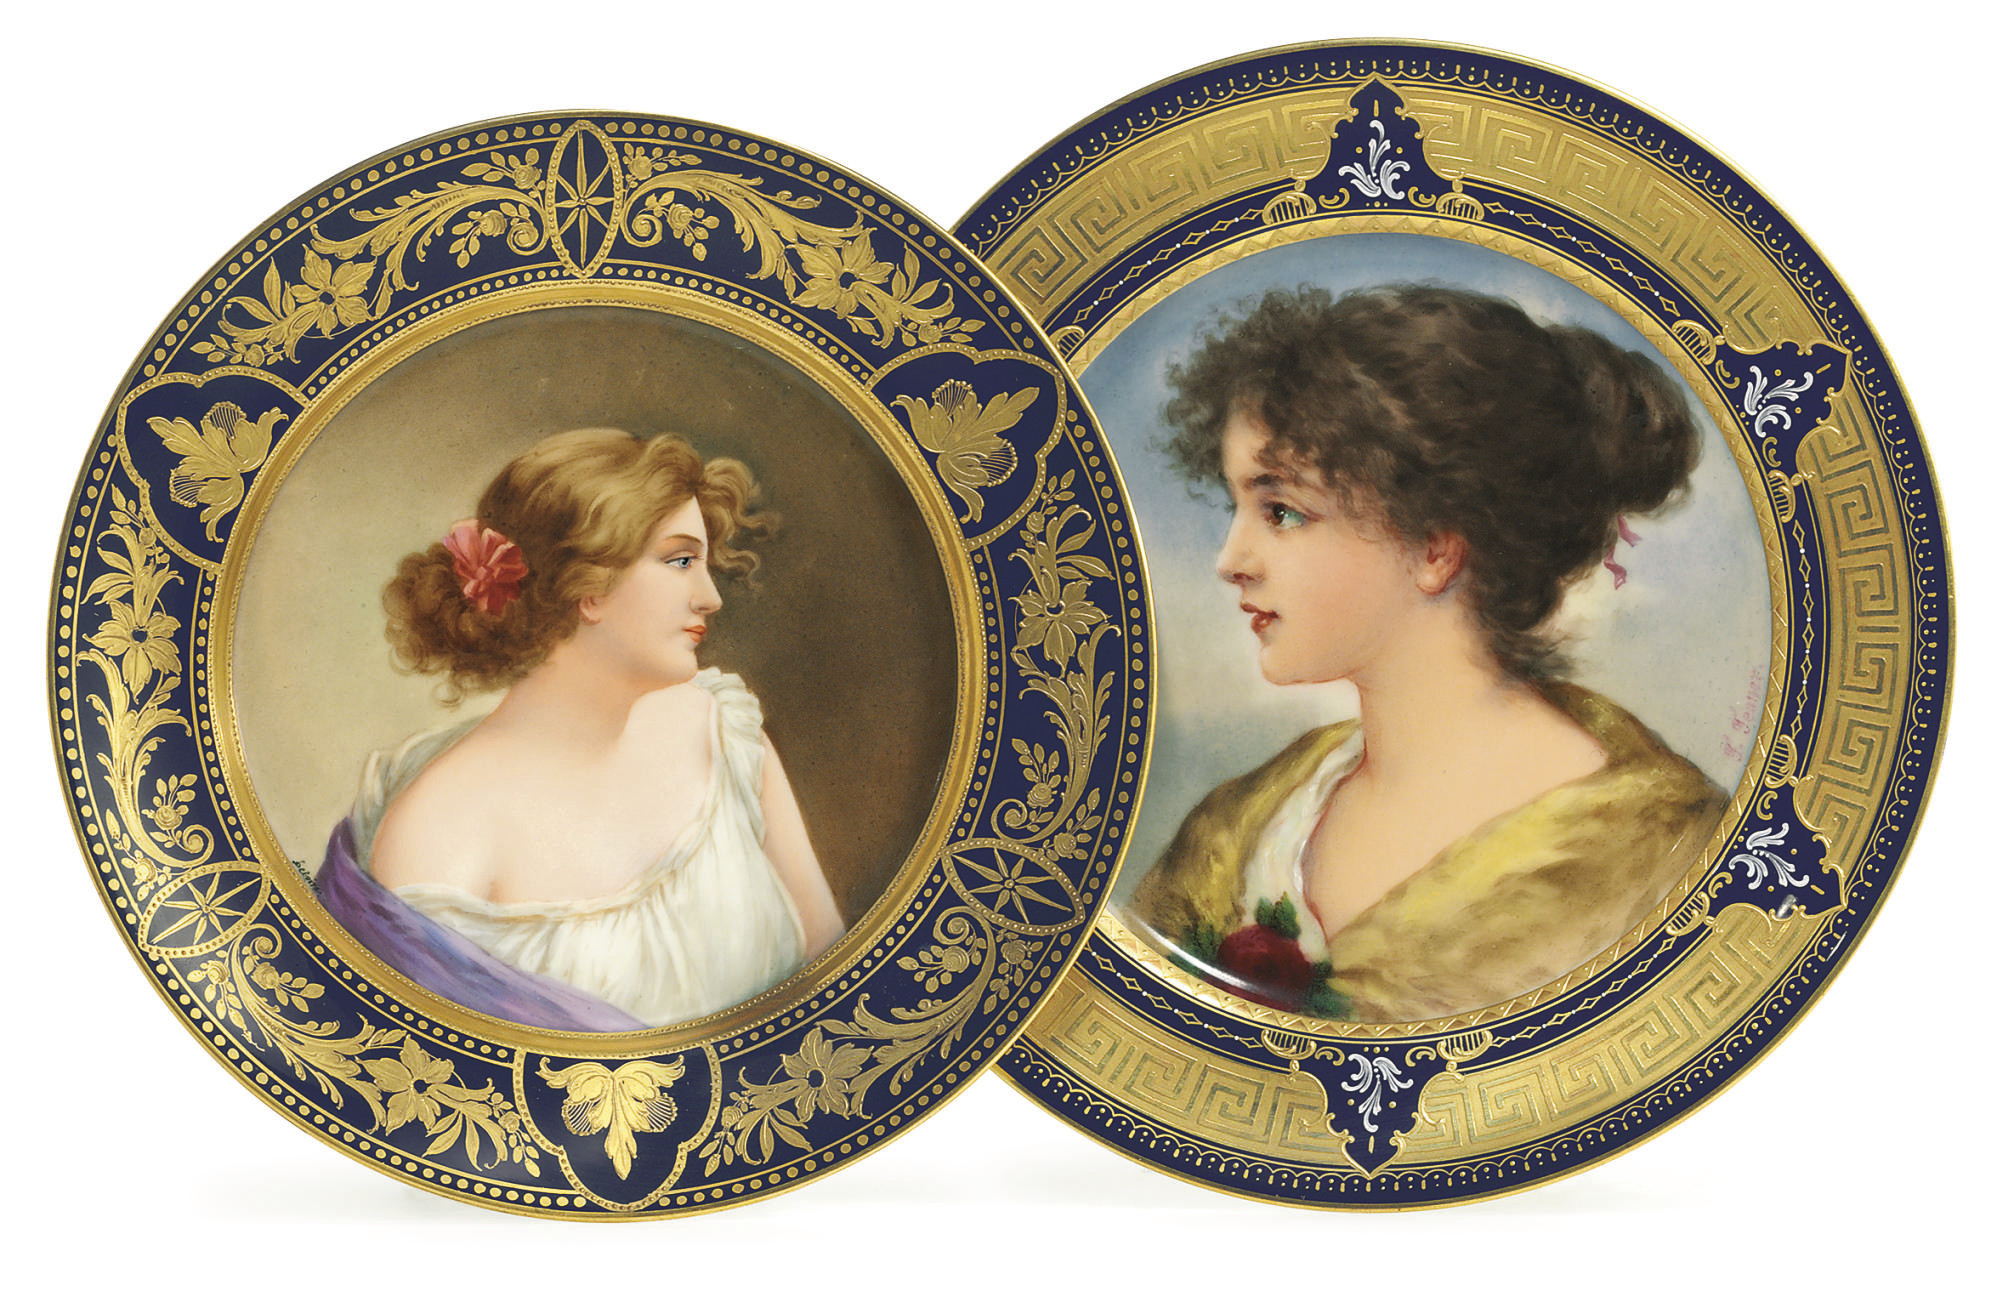 TWO VIENNA STYLE COBALT-BLUE GROUND PORTRAIT PLATES, 'SOURIRE.' AND 'INGEND'